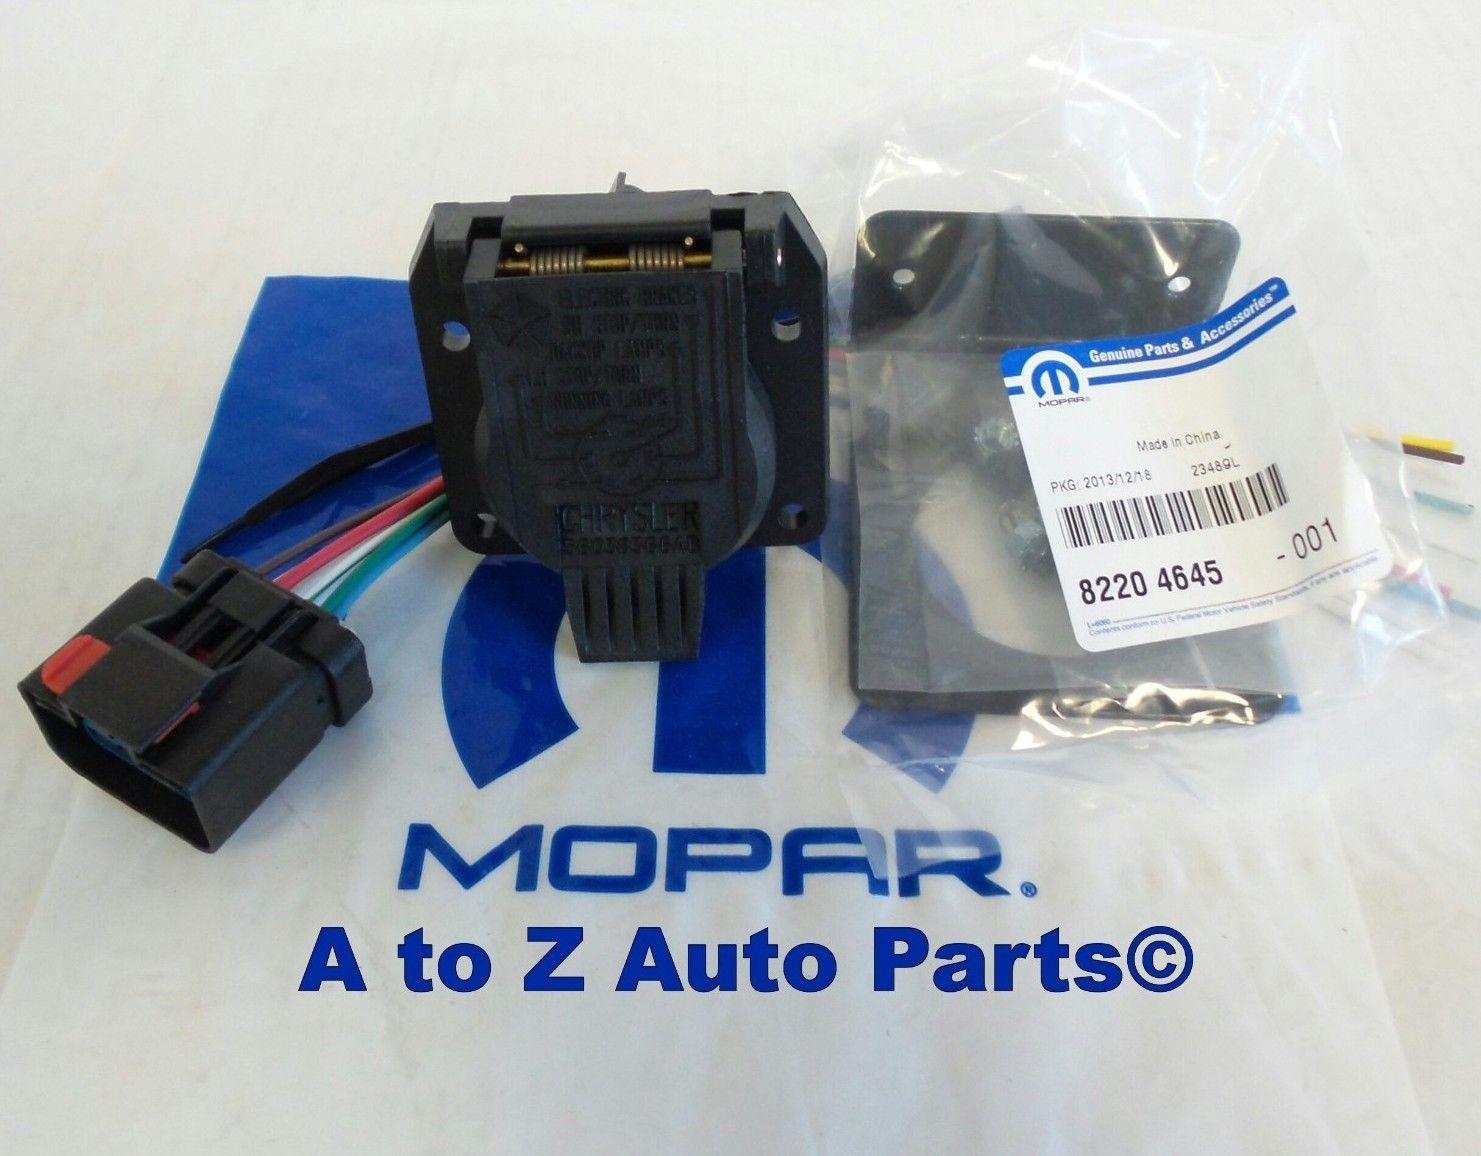 Mopar Oem Dodge Ram Trailer Tow Wiring Harness Kit Solutions Repair Dakota Durango Jeep 7 Way And 37 Similar Items